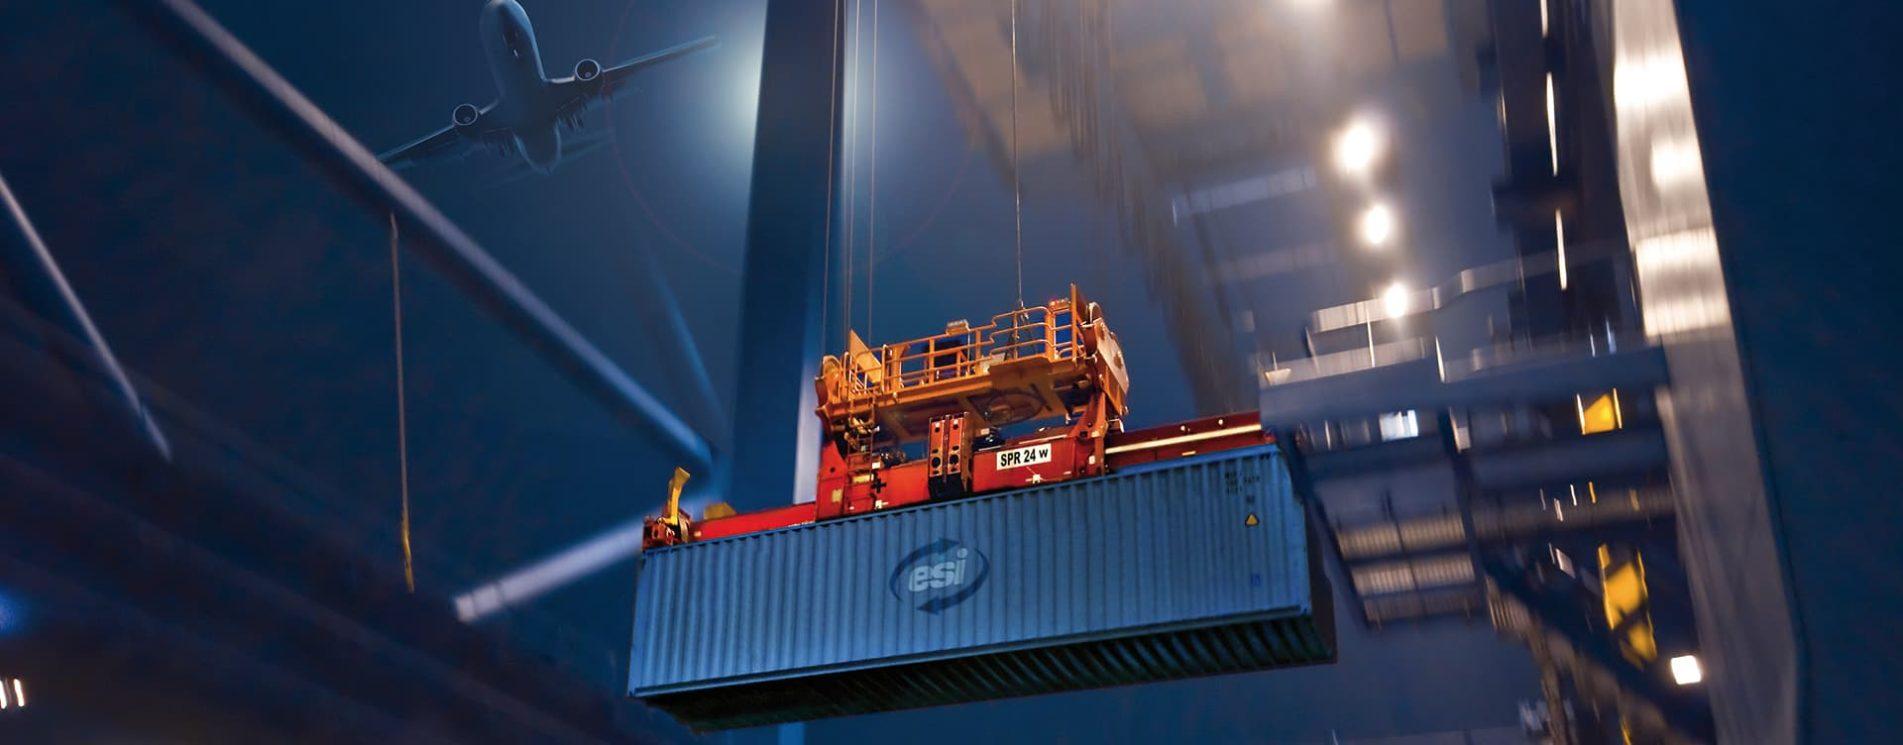 Group ESI transportation & logistic worldwild